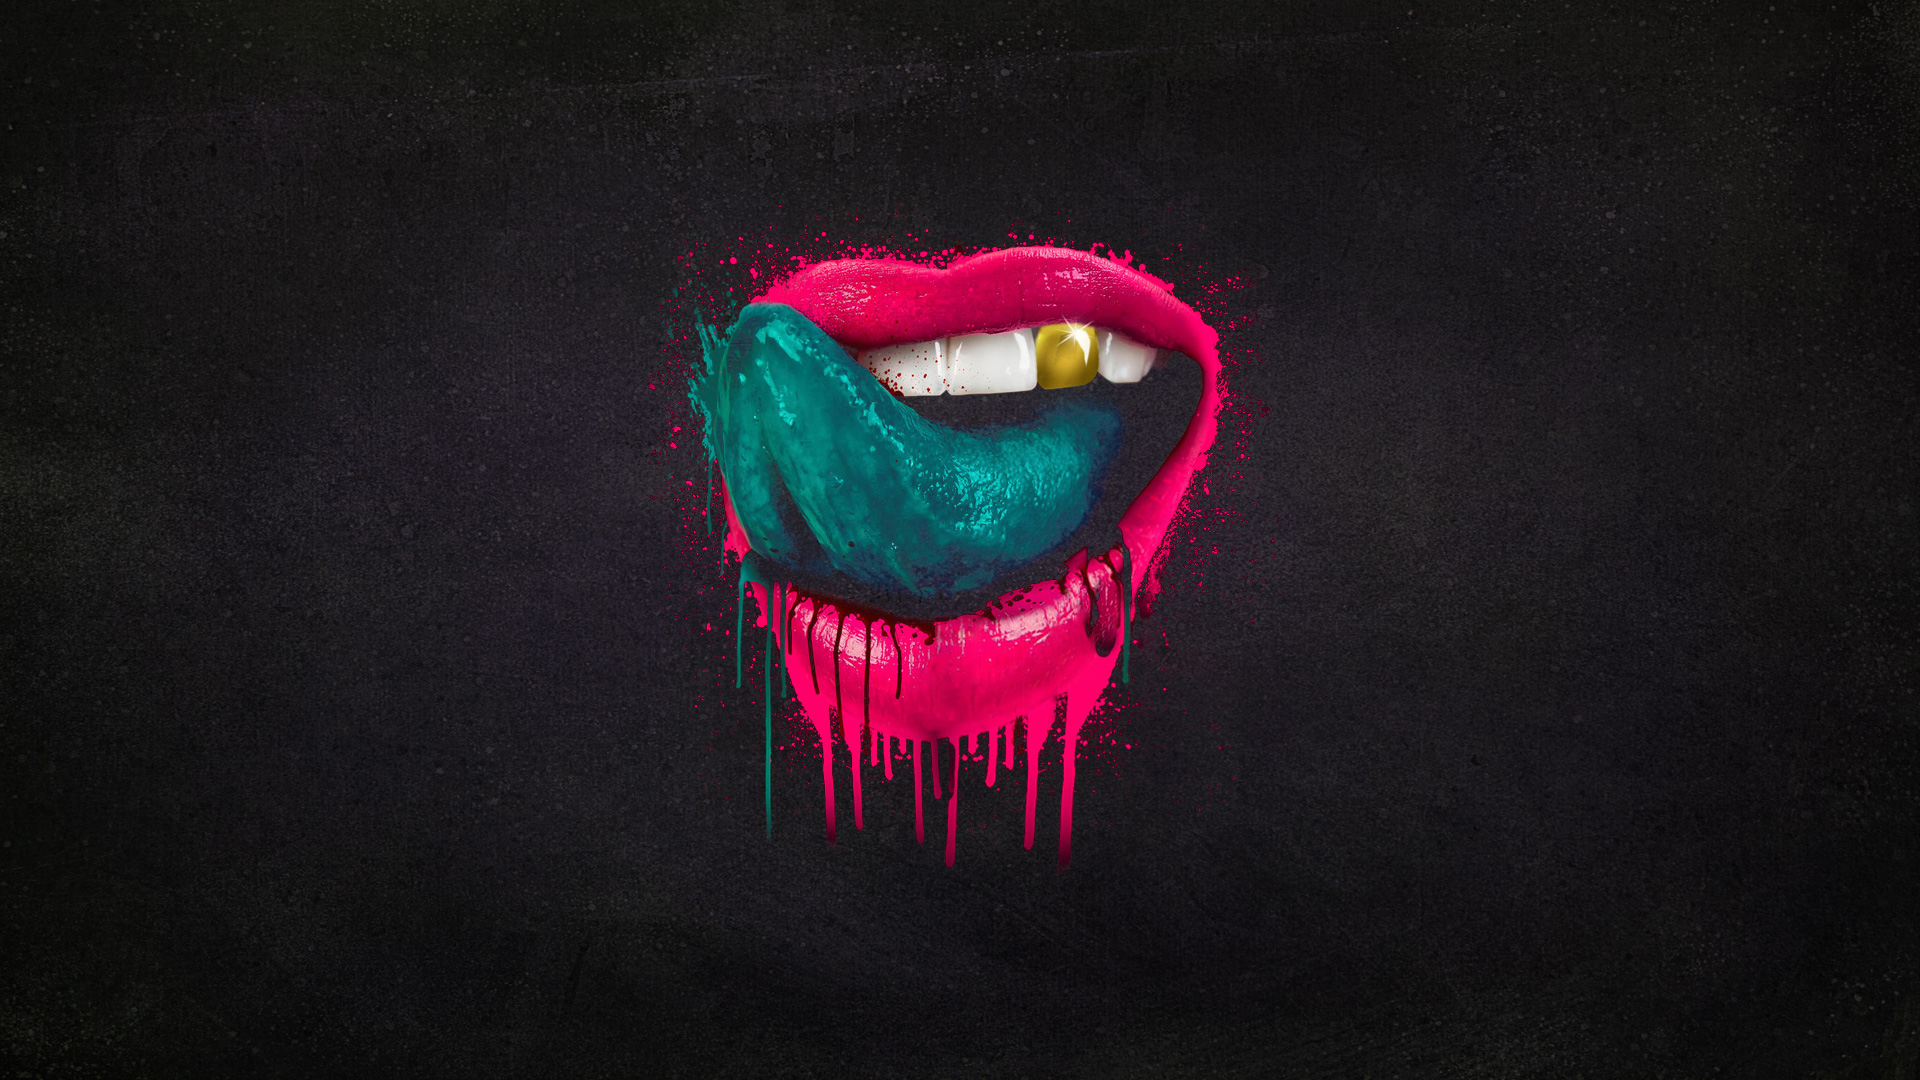 mouth tongue splatter lips paint wallpaper | 1920x1080 | 136921